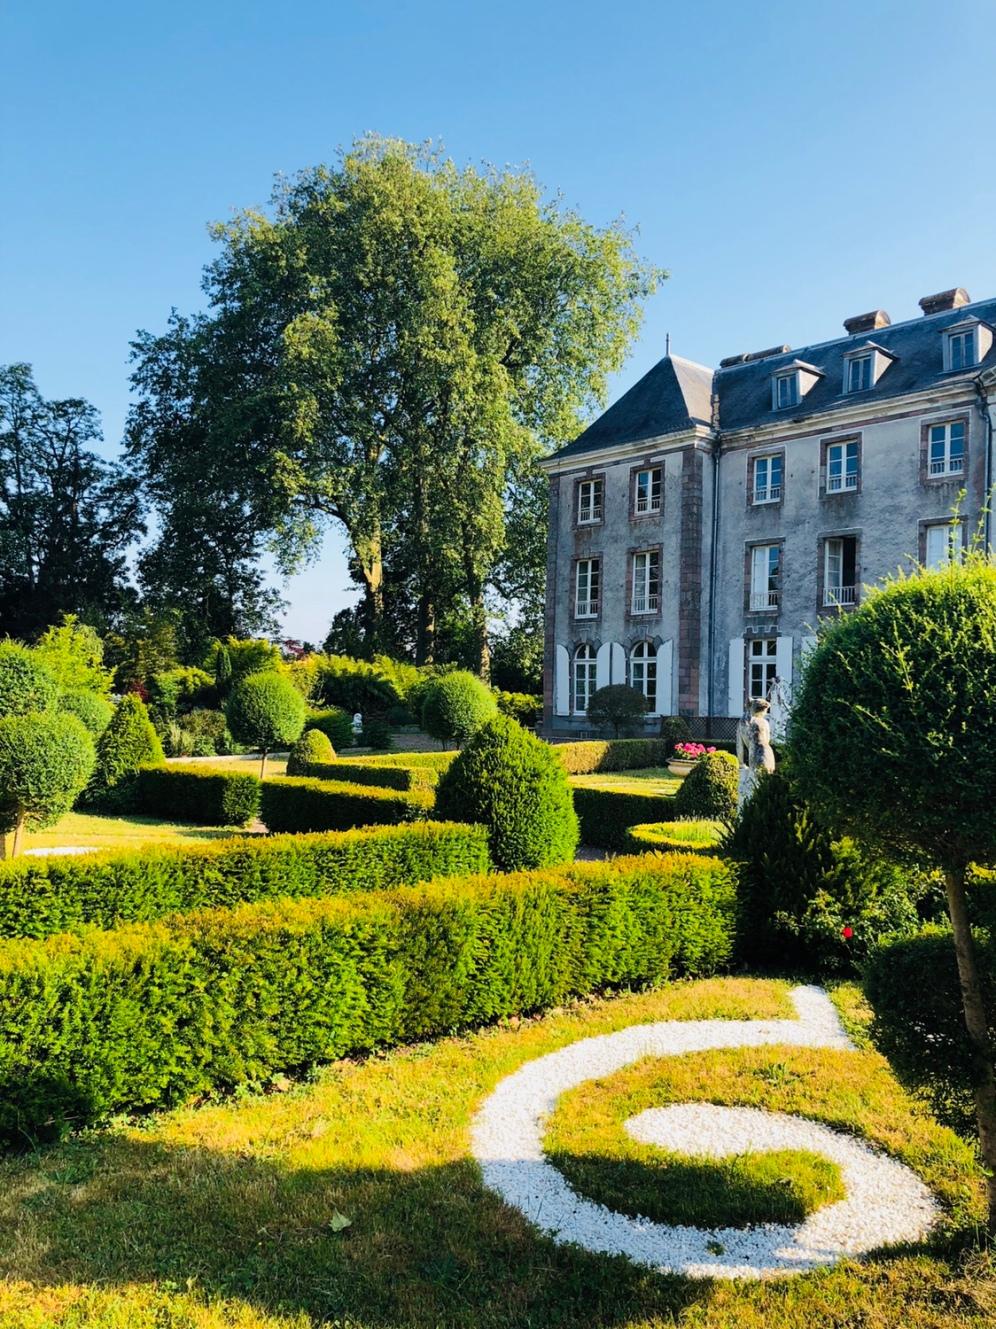 The stunning gardens